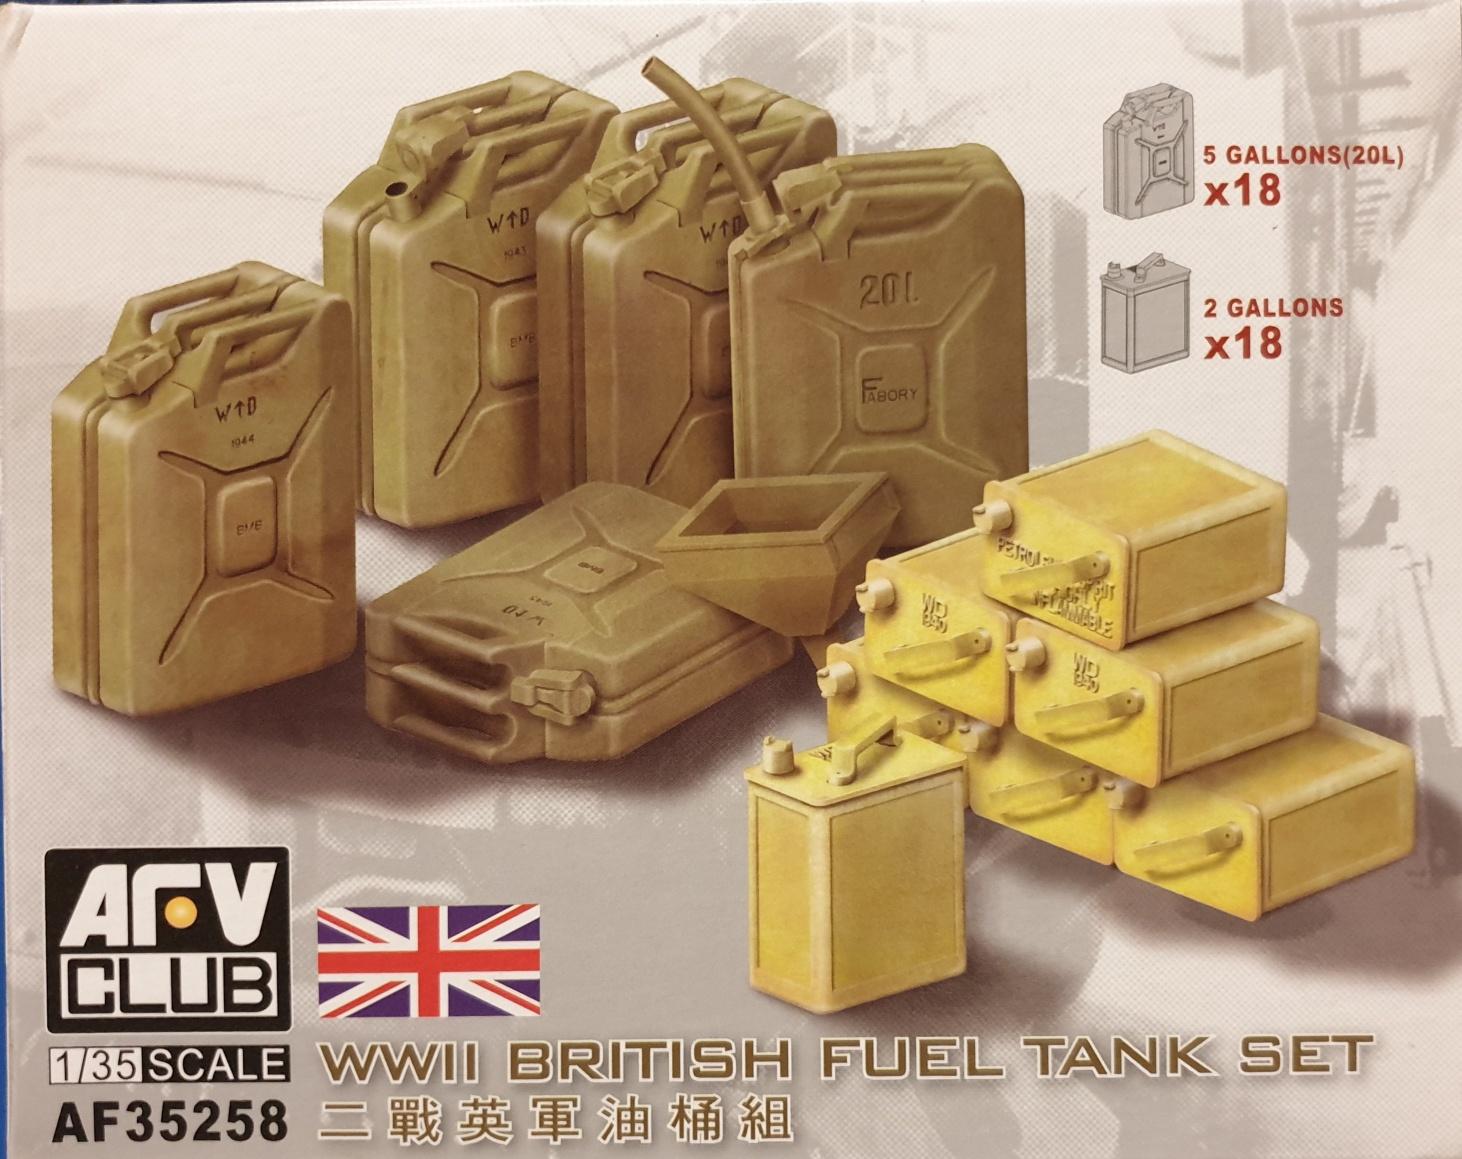 AFV Club AF 35258 WWII British Fuel Tank Set